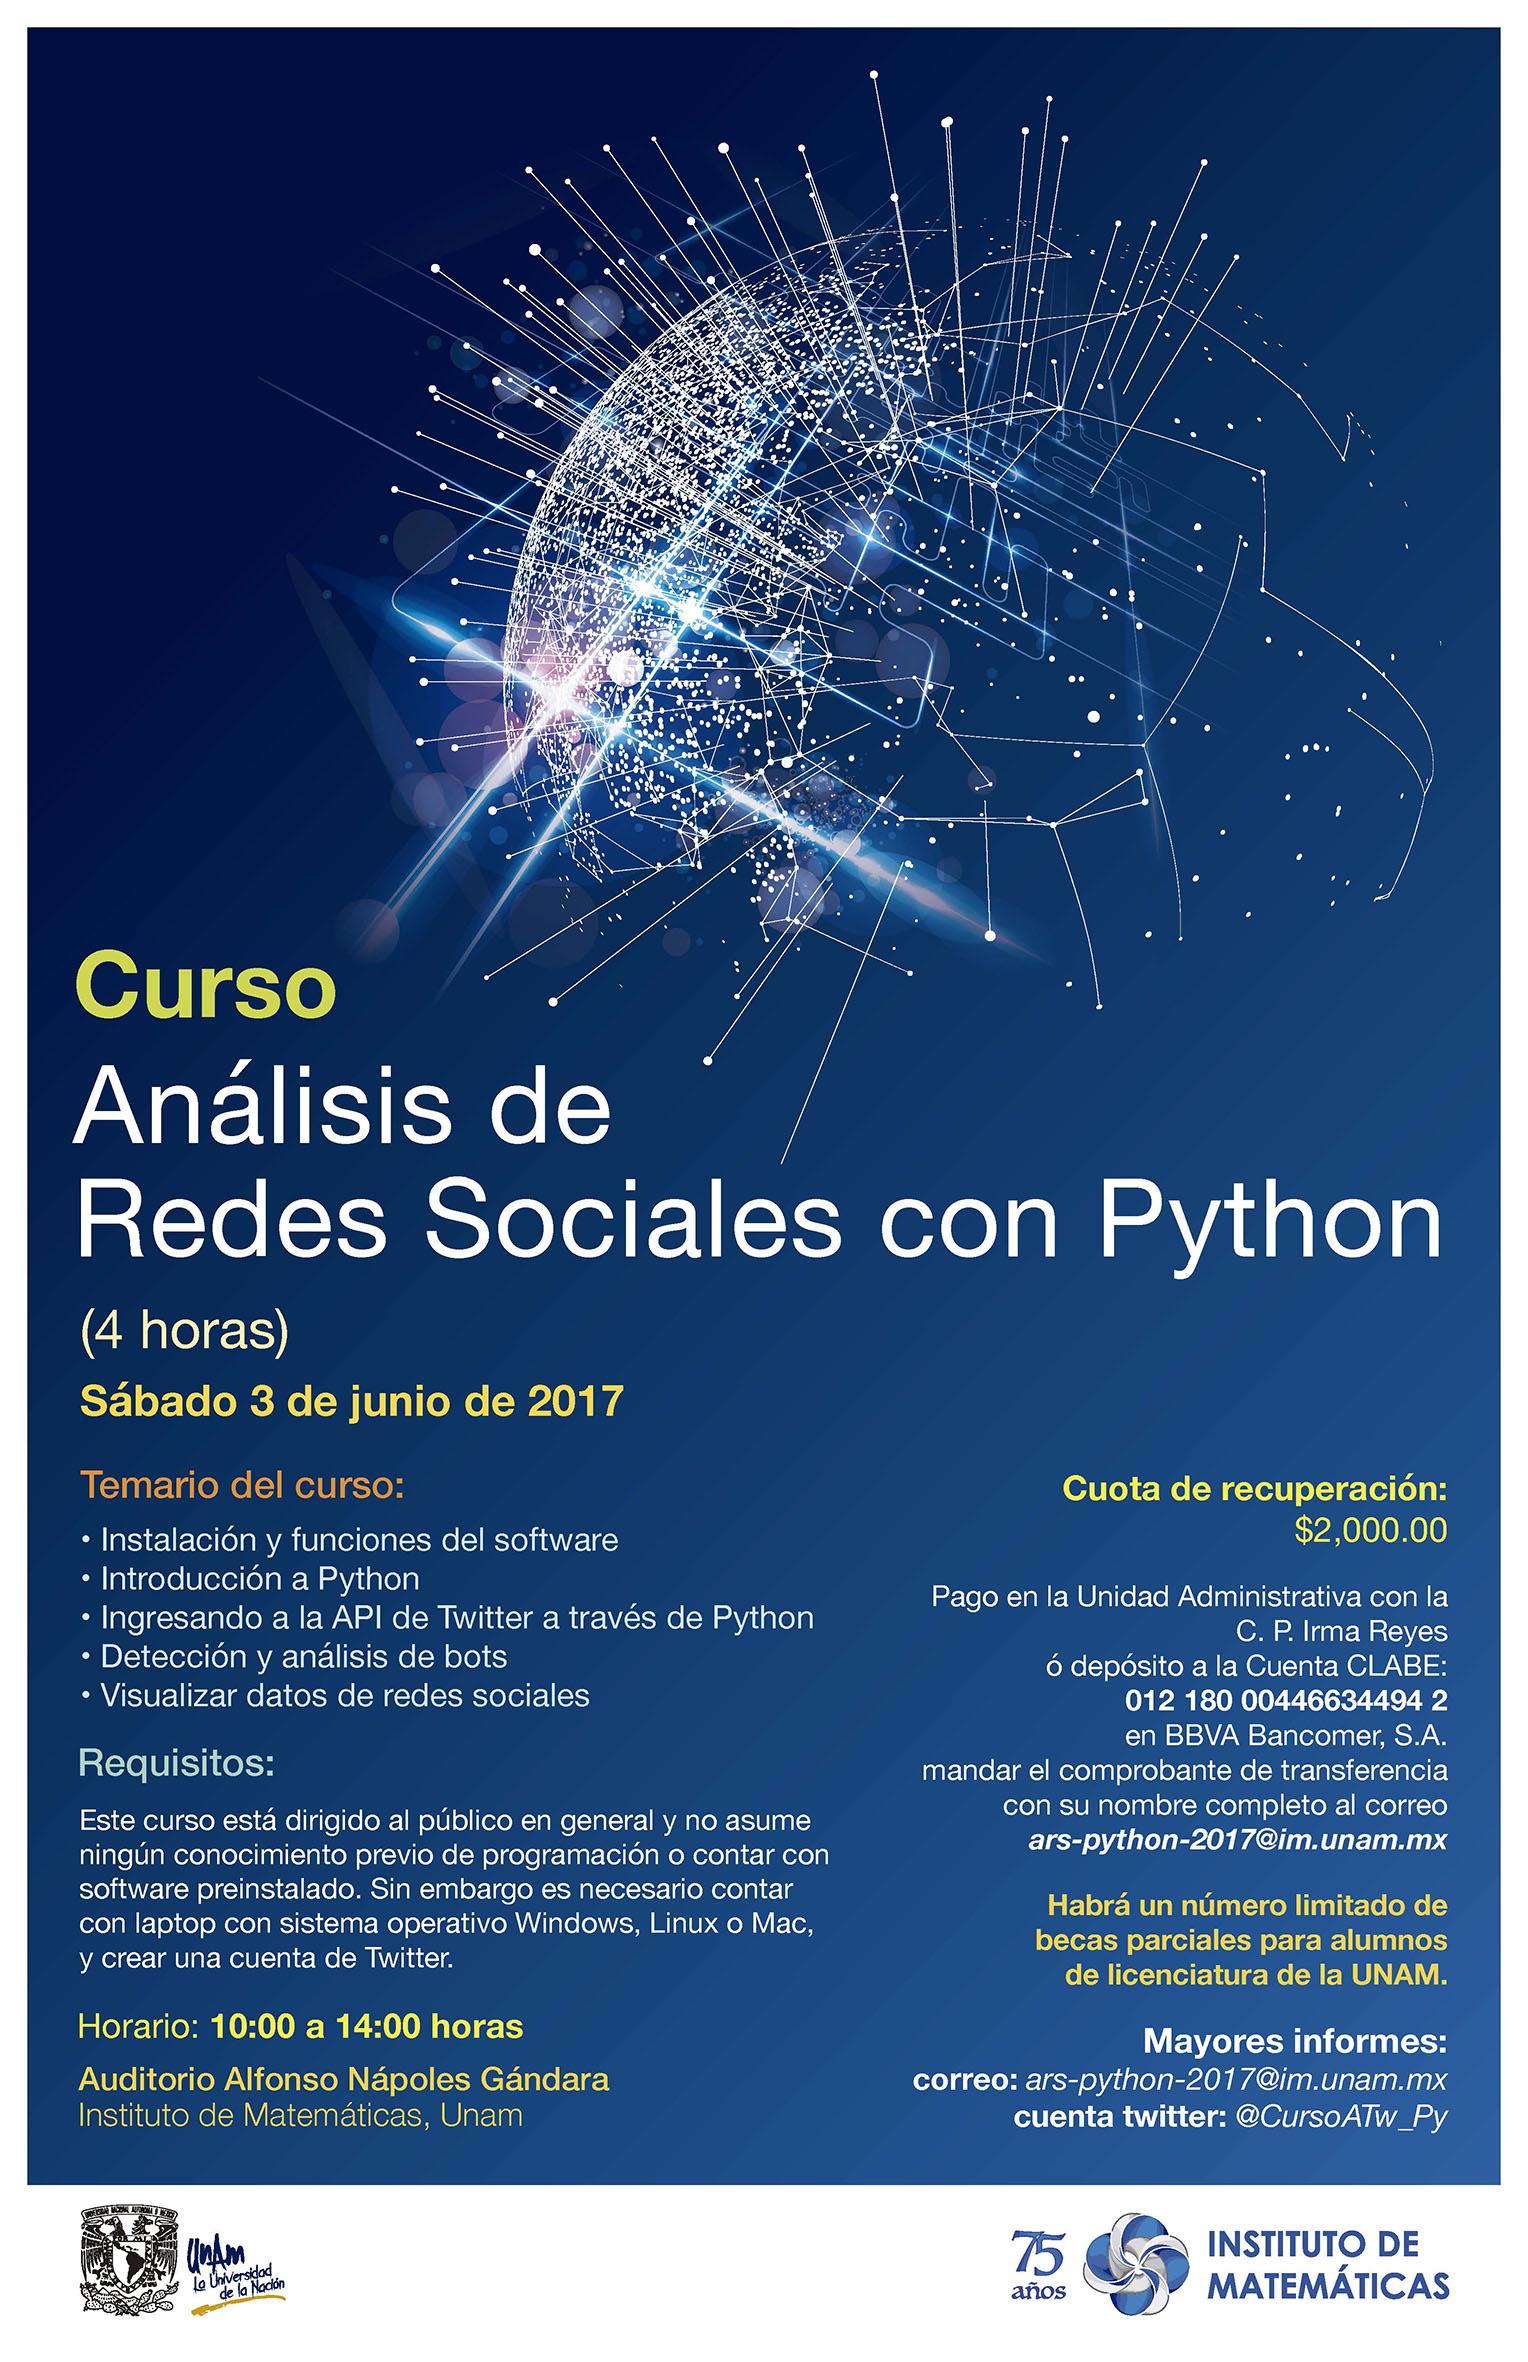 Curso: Análisis de Redes Sociales con Python